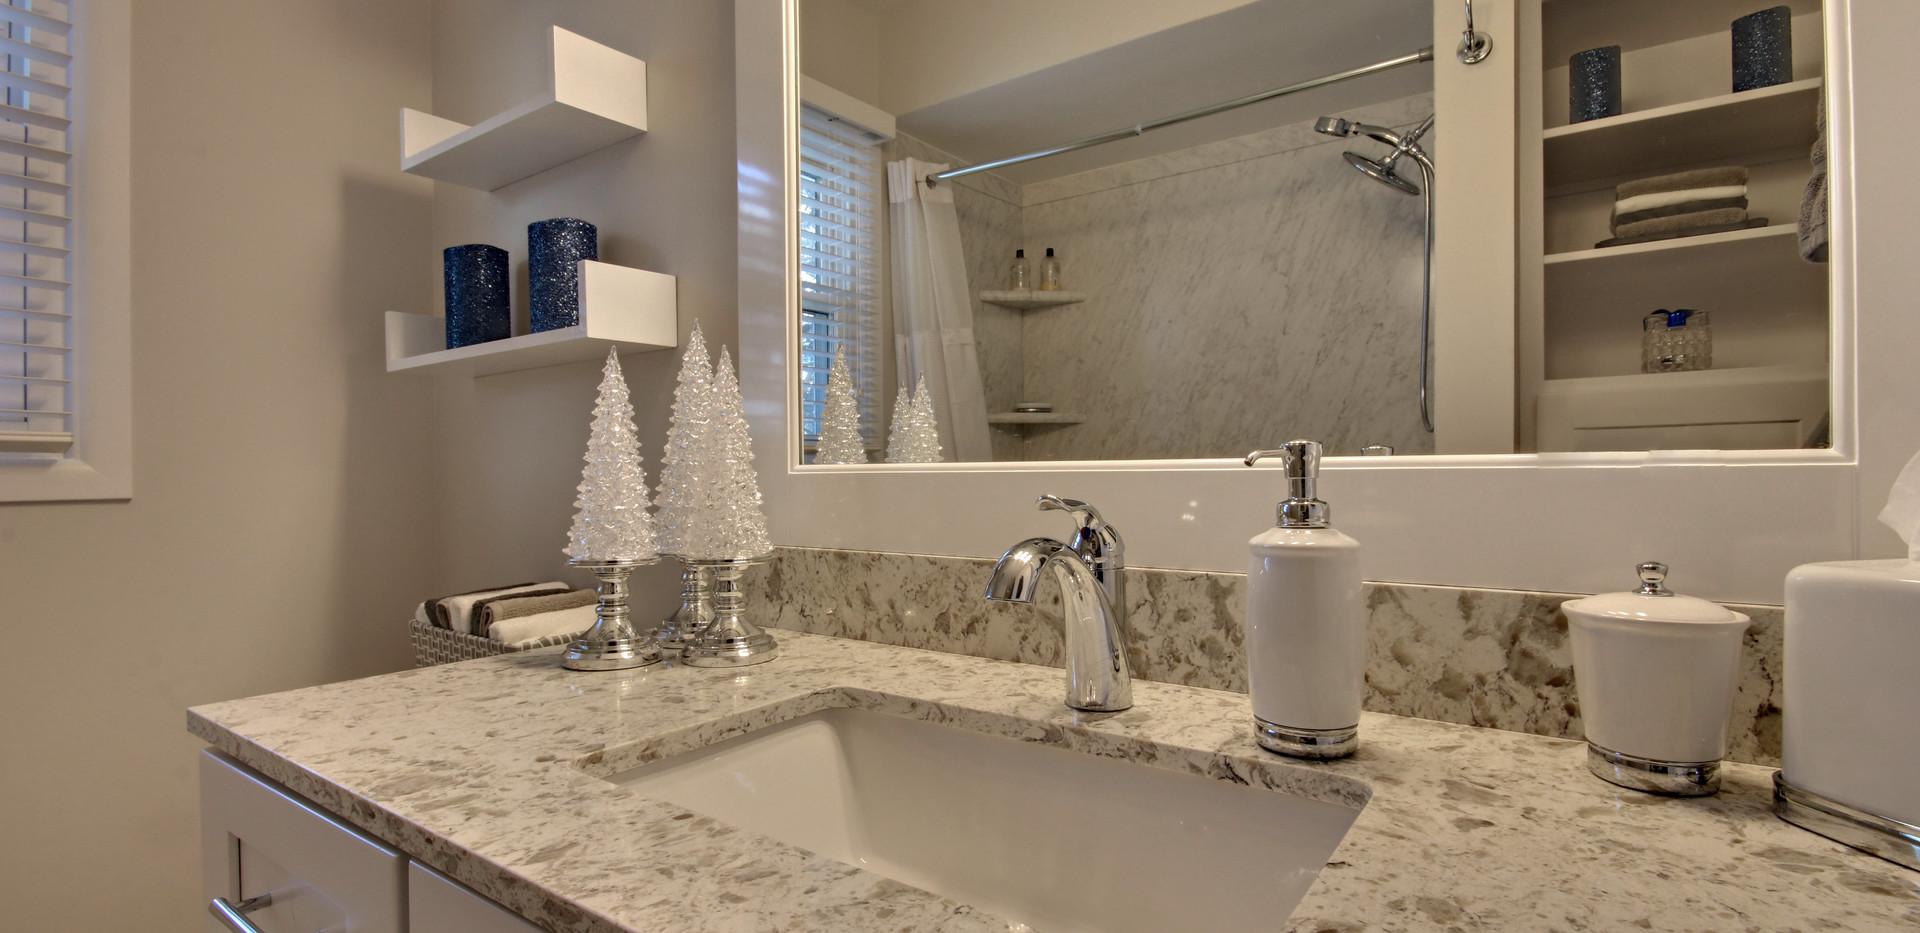 Beautifully decorated full bathroom remodel in Grandville bathroom remodel